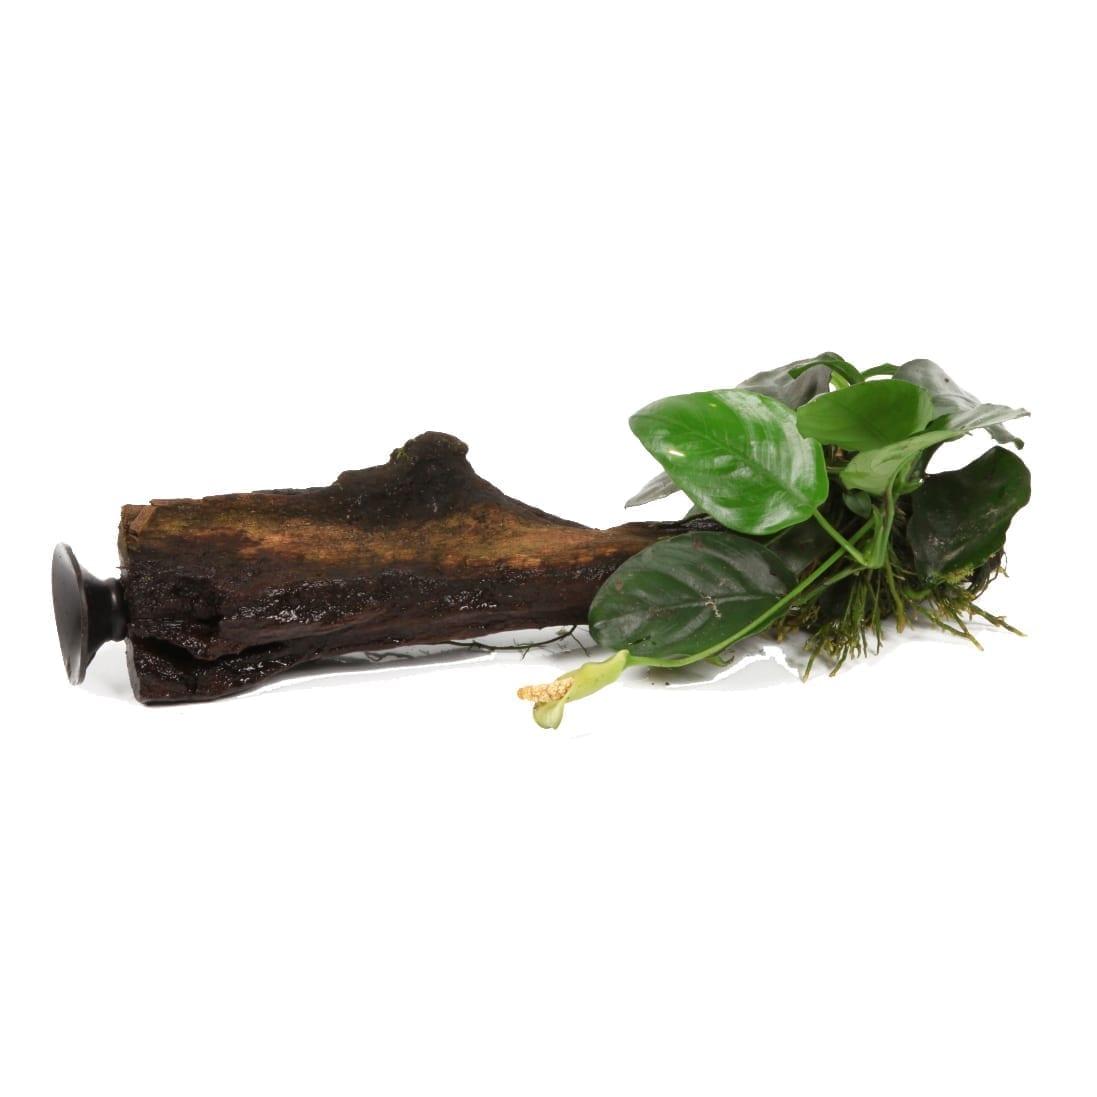 Tropica Anubis Barteri var. Nana ( On wood with Sucker )